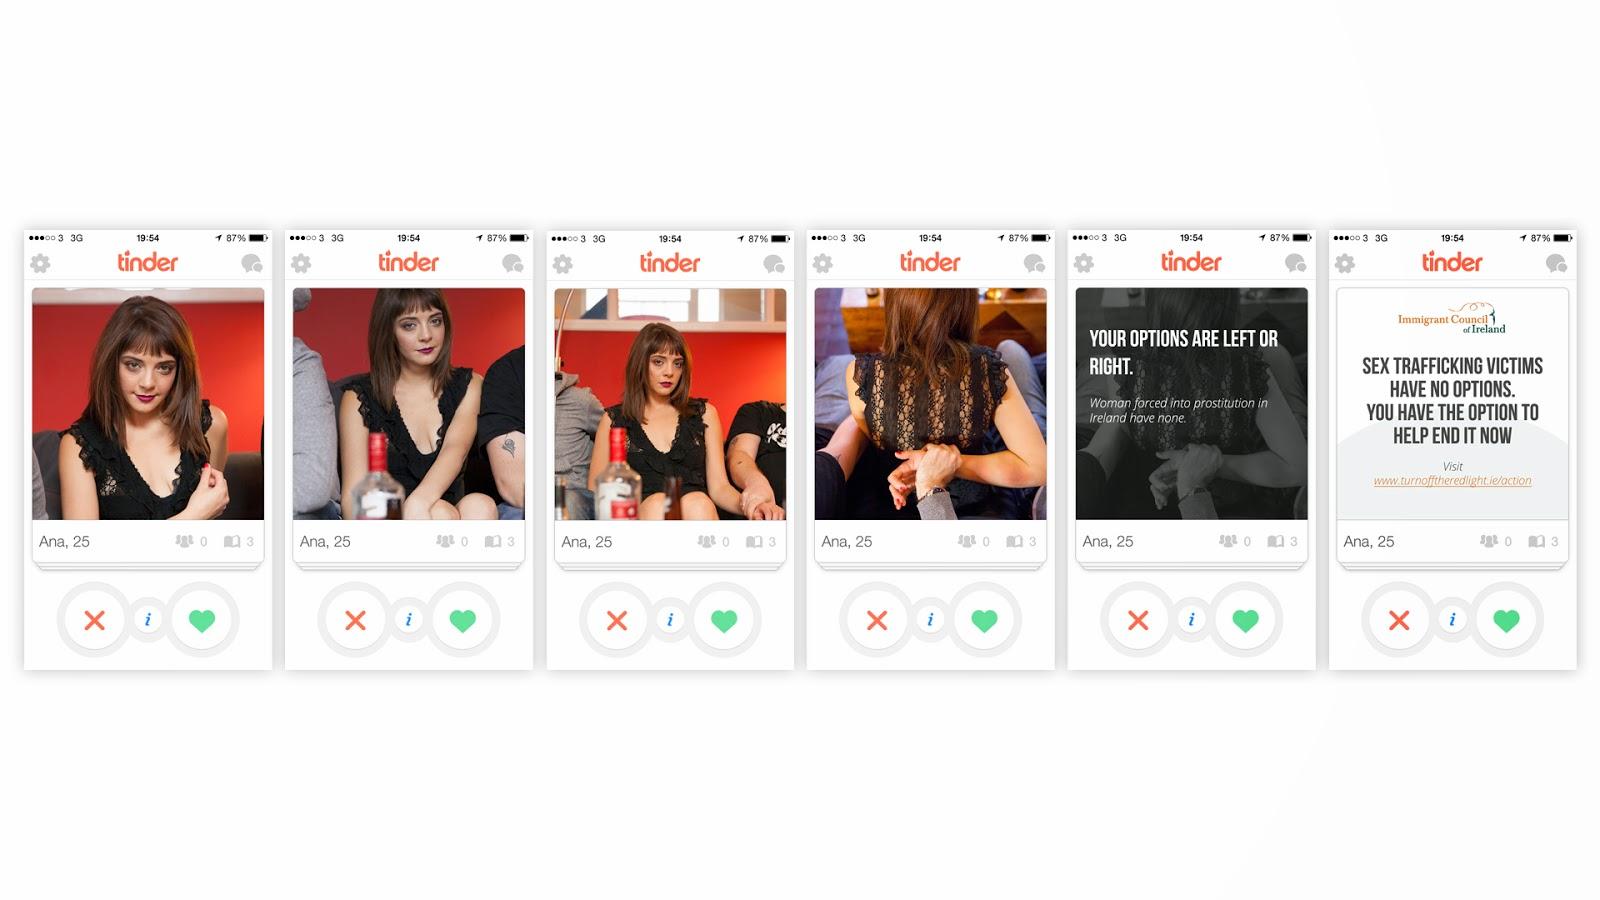 tinder dating app ireland